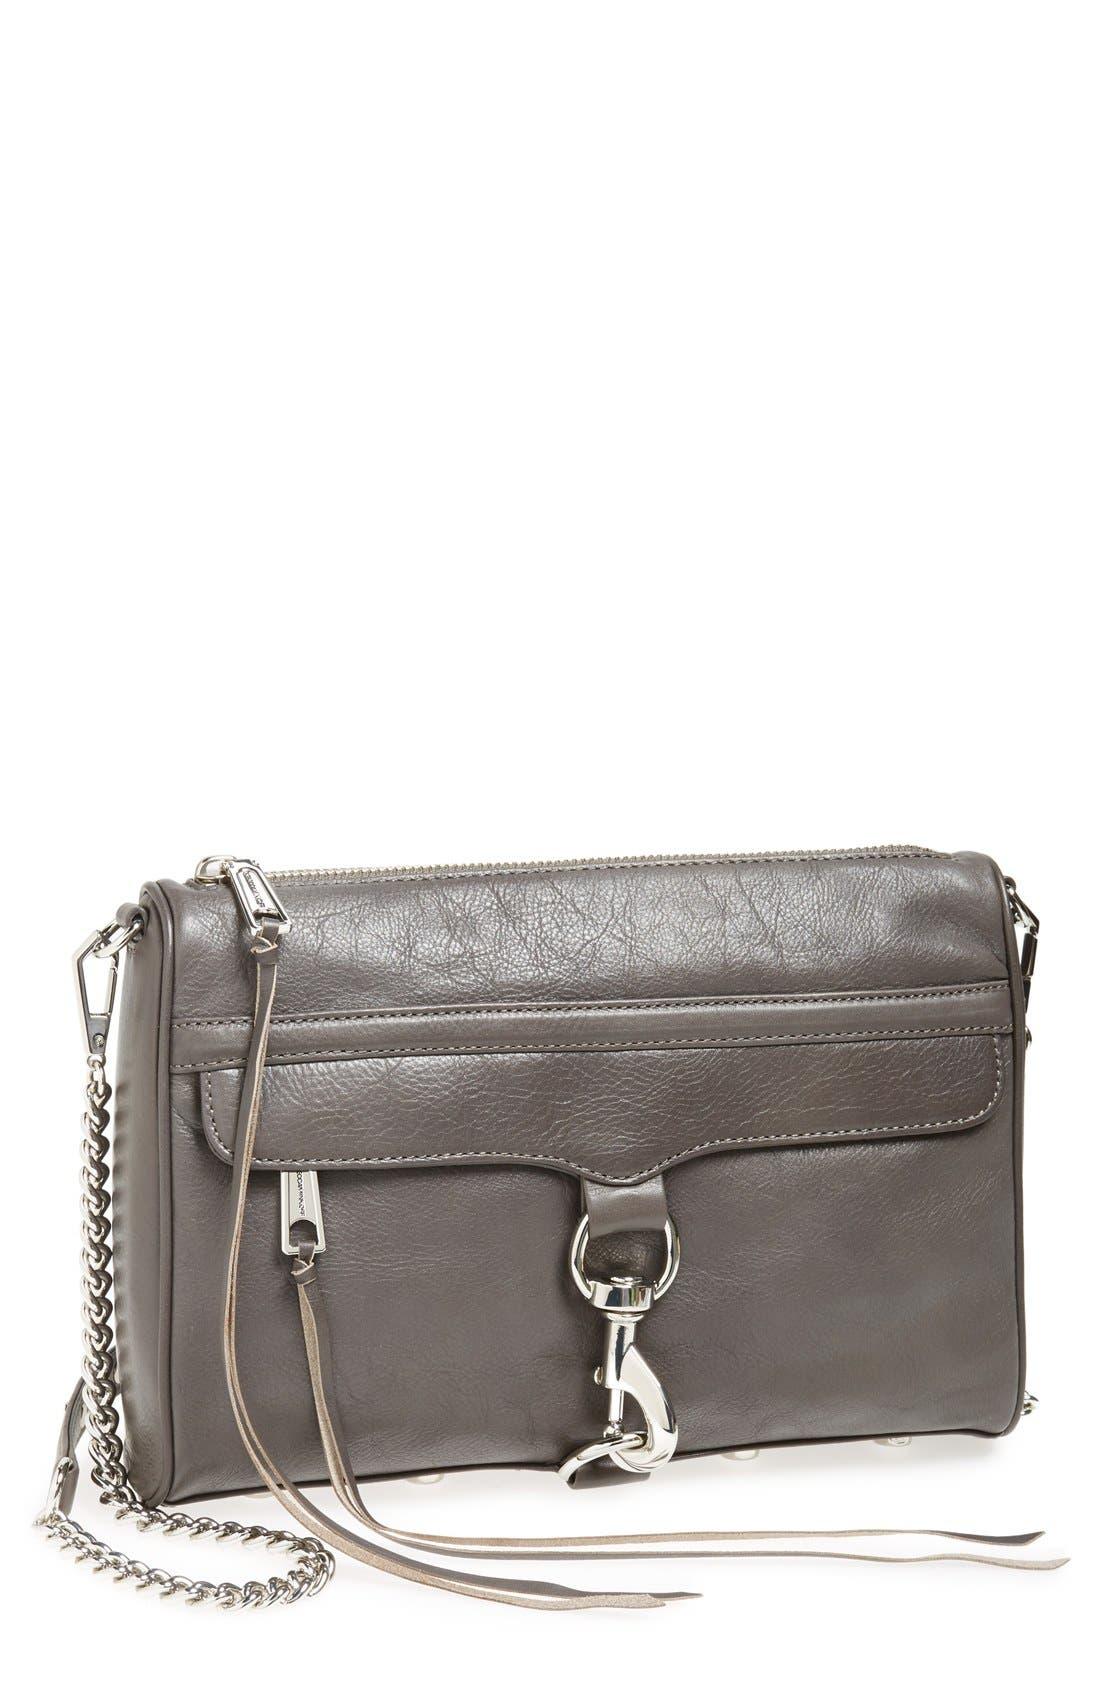 Alternate Image 1 Selected - Rebecca Minkoff 'MAC' Convertible Crossbody Bag